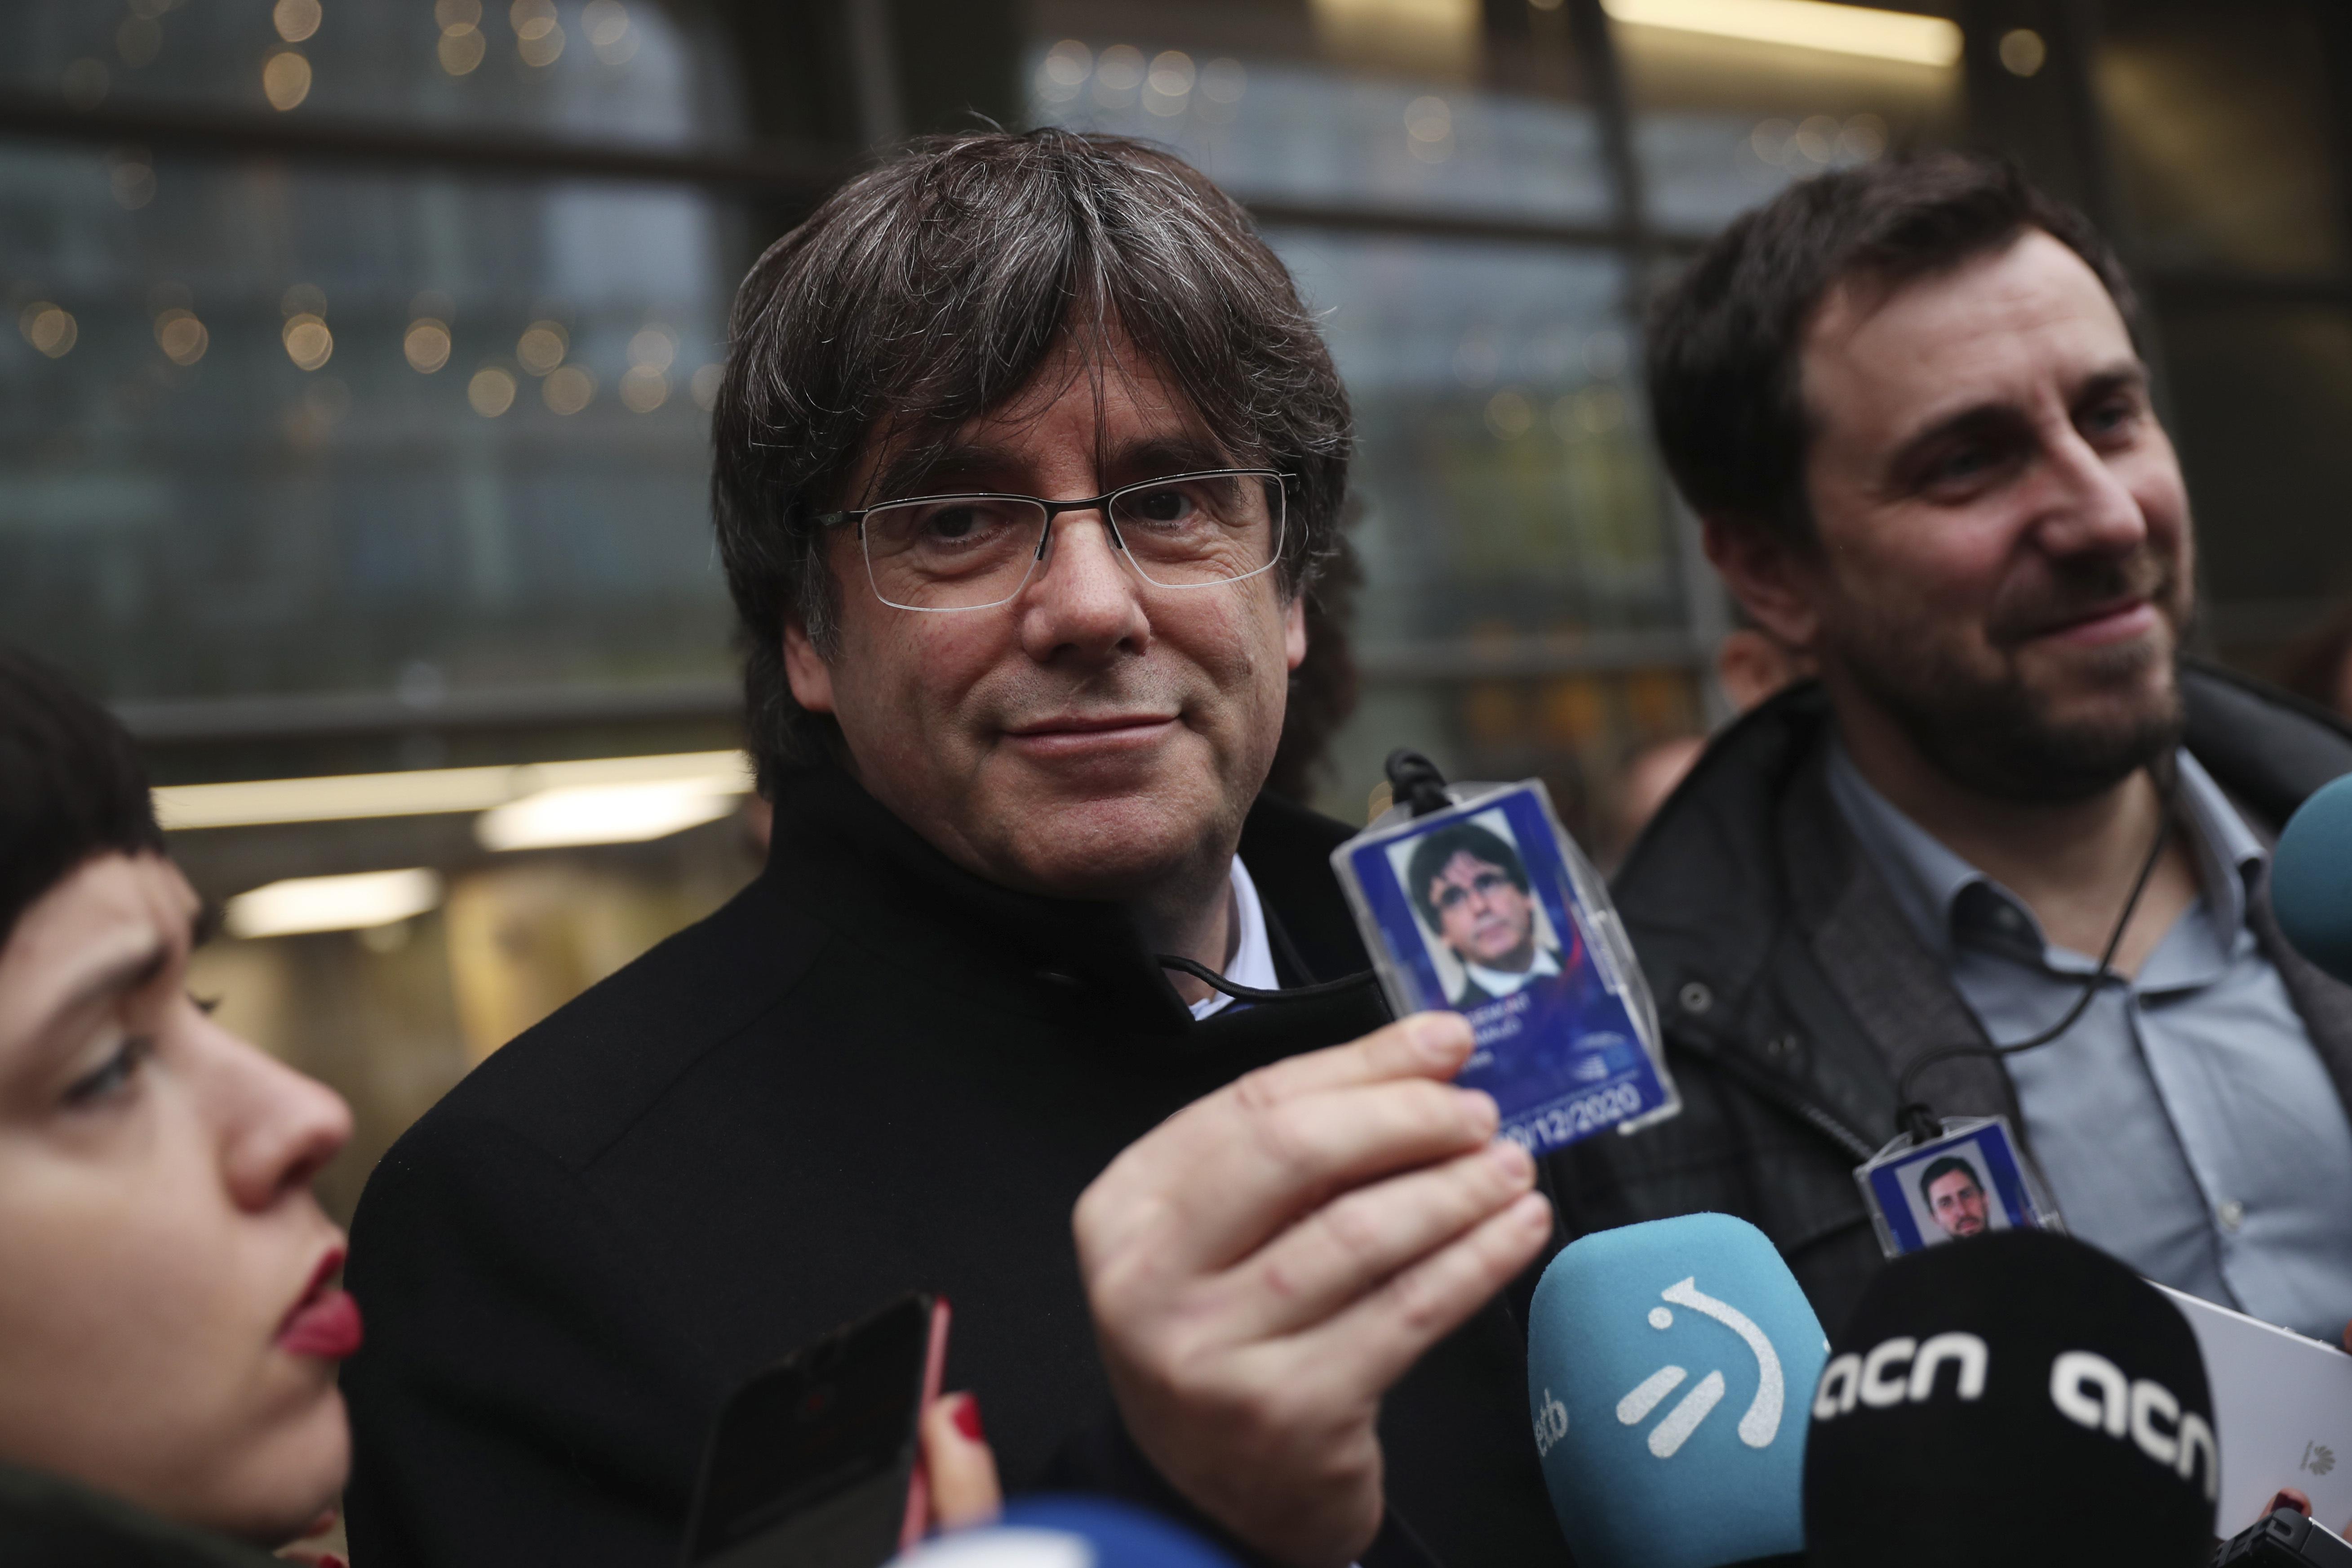 Belgian judge suspends warrant for Catalonias Puigdemont